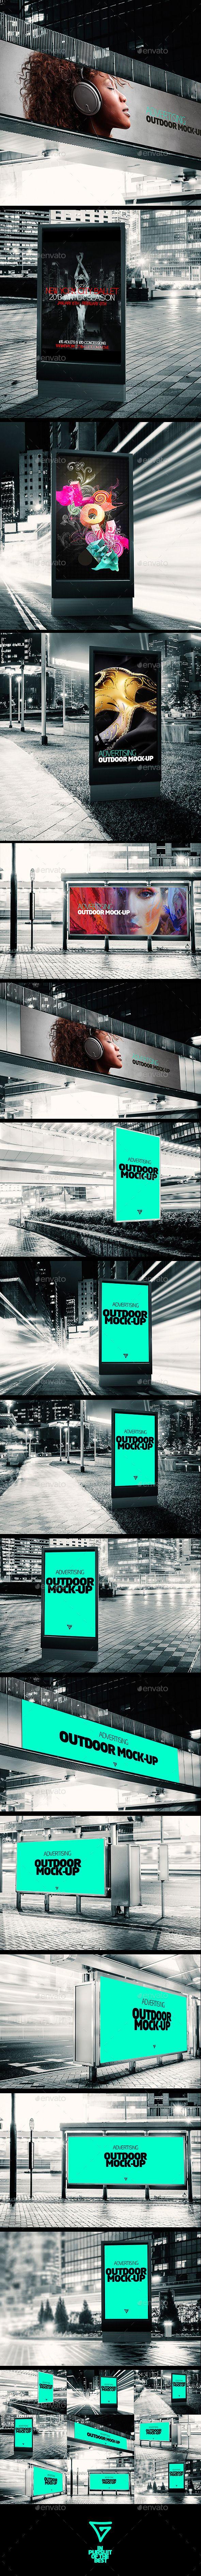 Outdoor Banner Advertising Mock-ups | Download: http://graphicriver.net/item/outdoor-banner-advertising-mockups/11024980?ref=ksioks